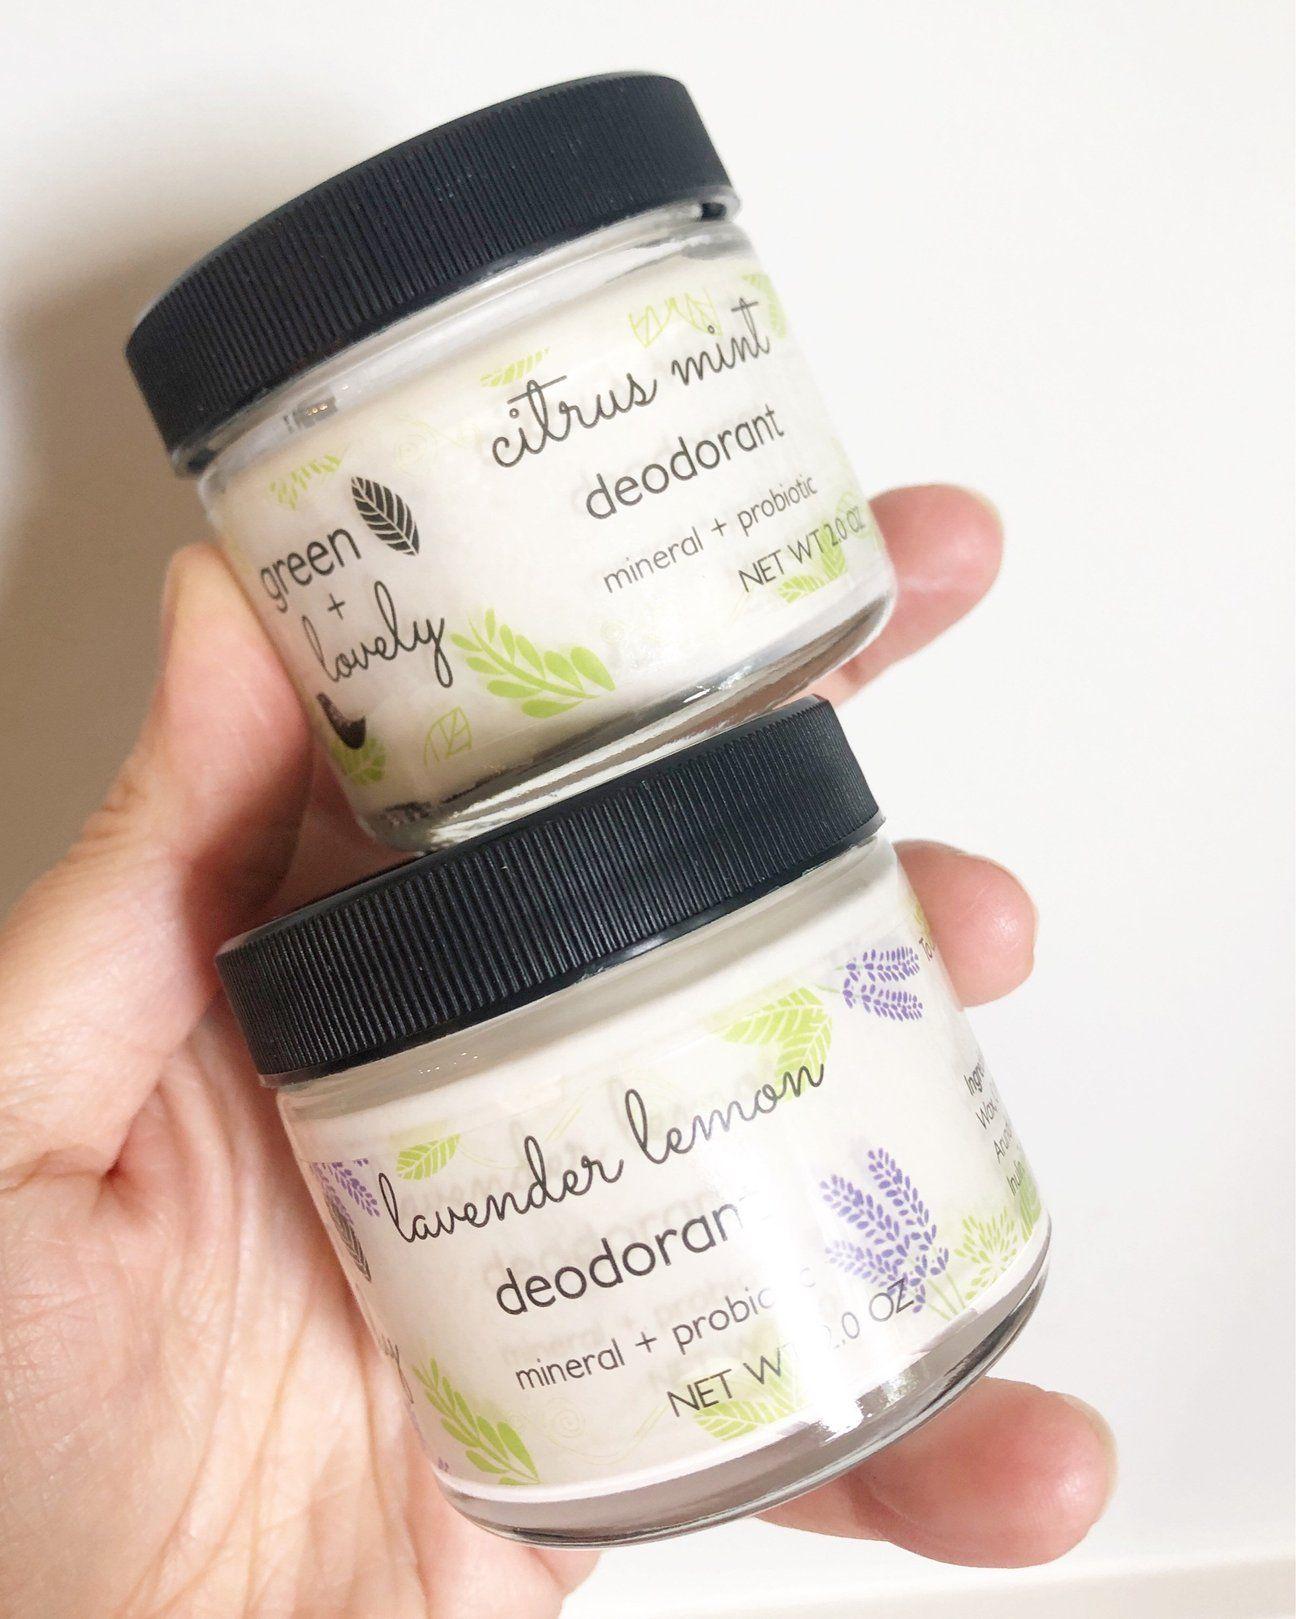 Deodorant lavender lemon mineral probiotic vegan in